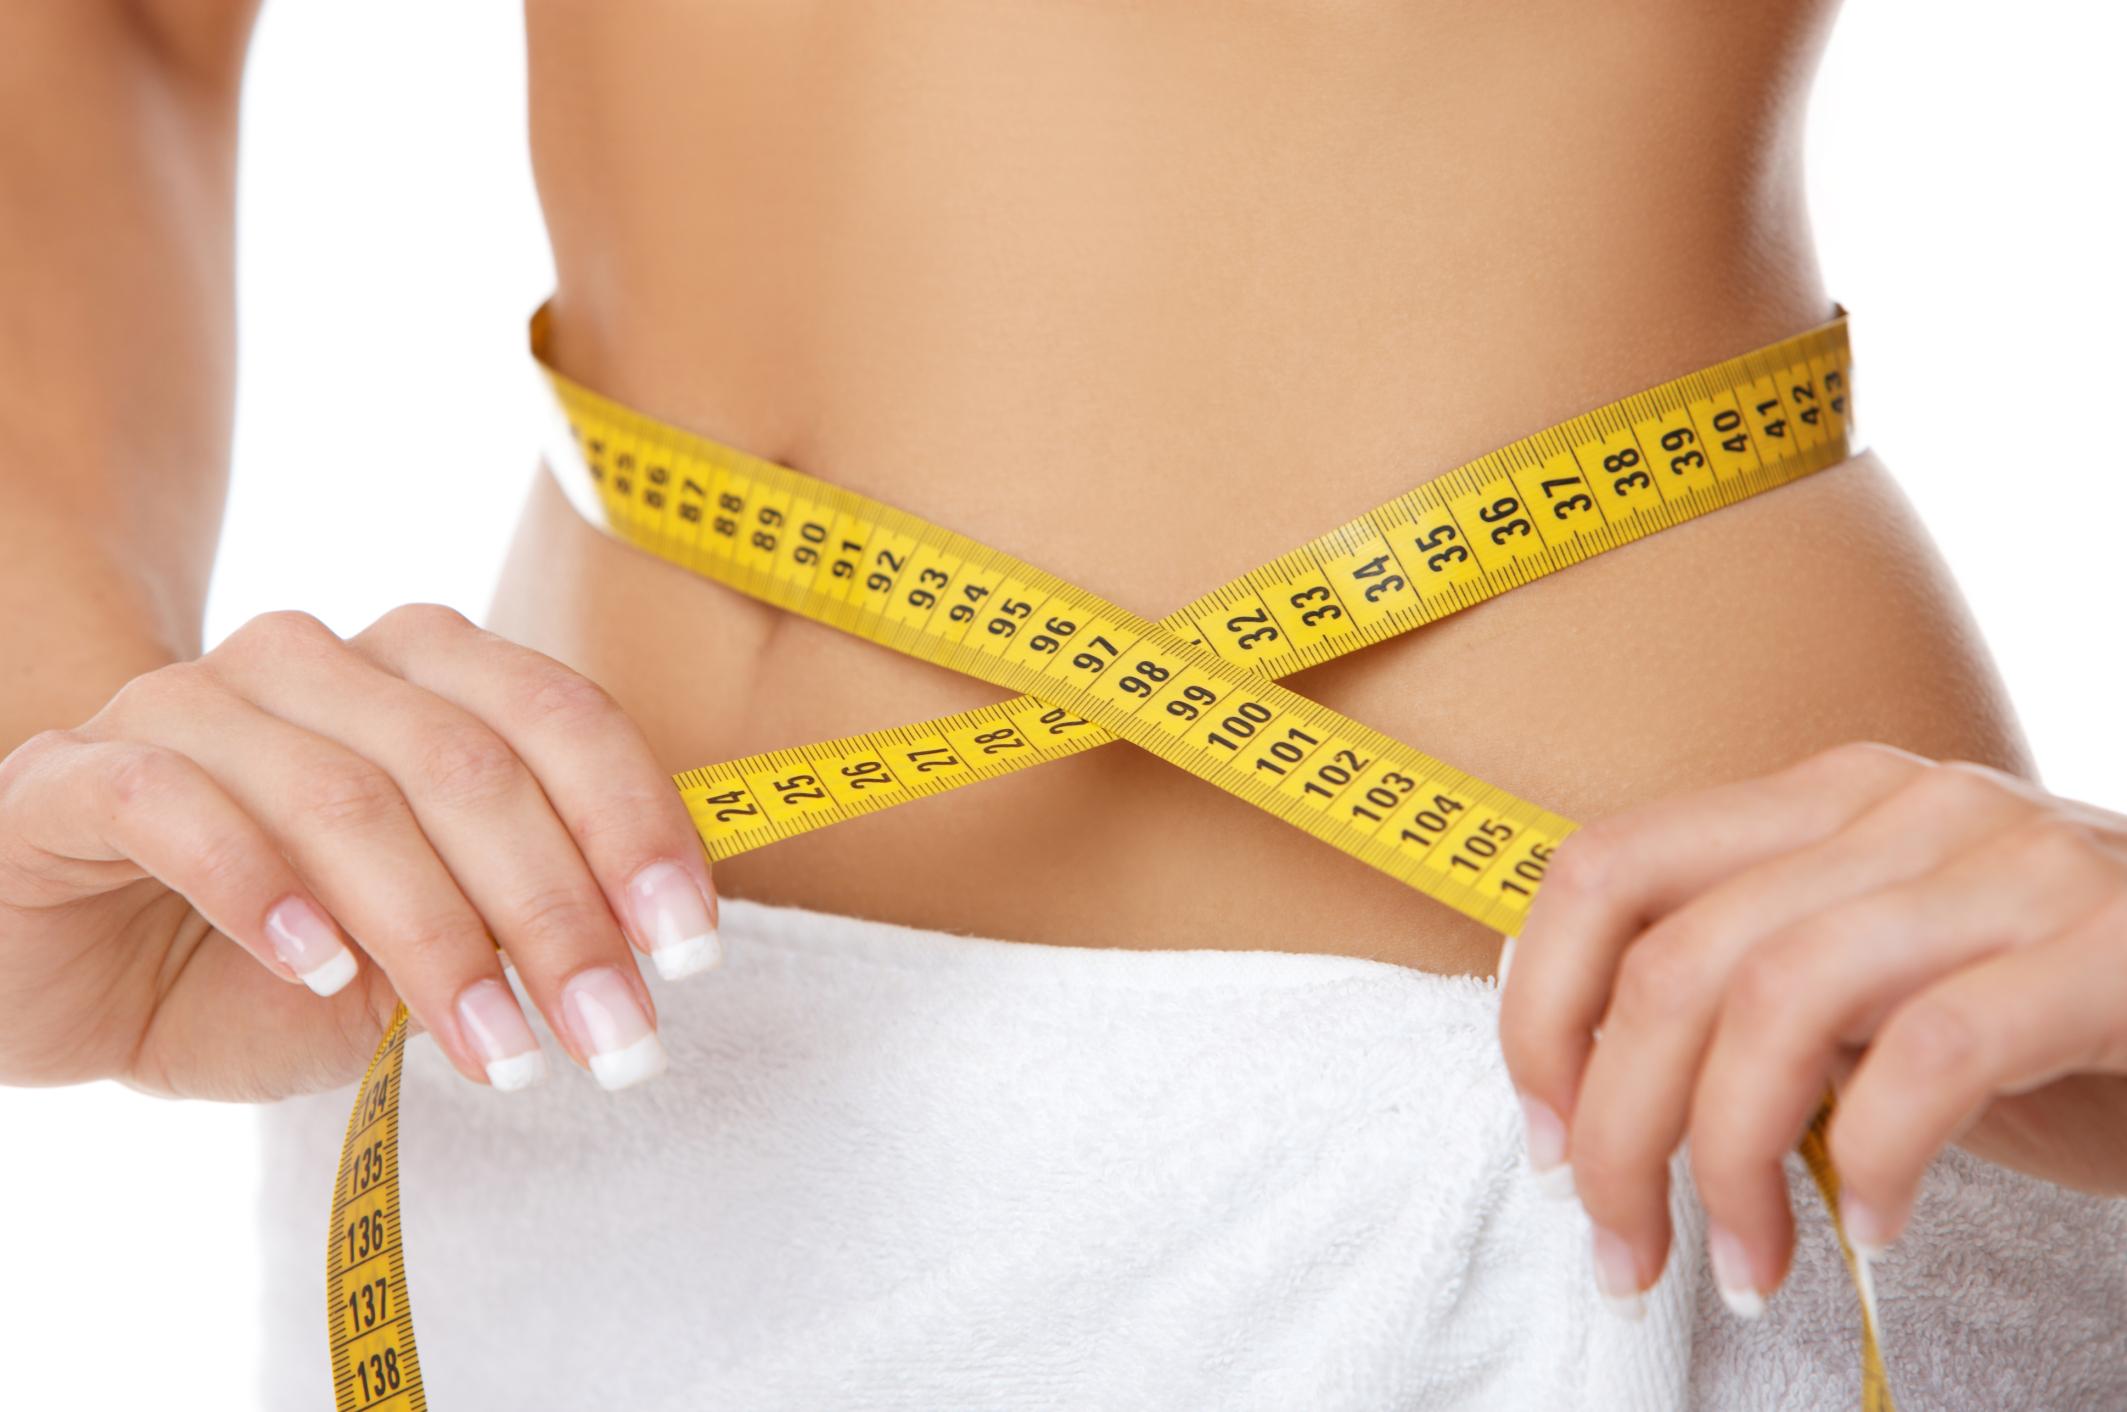 Unhealthy Weight Loss